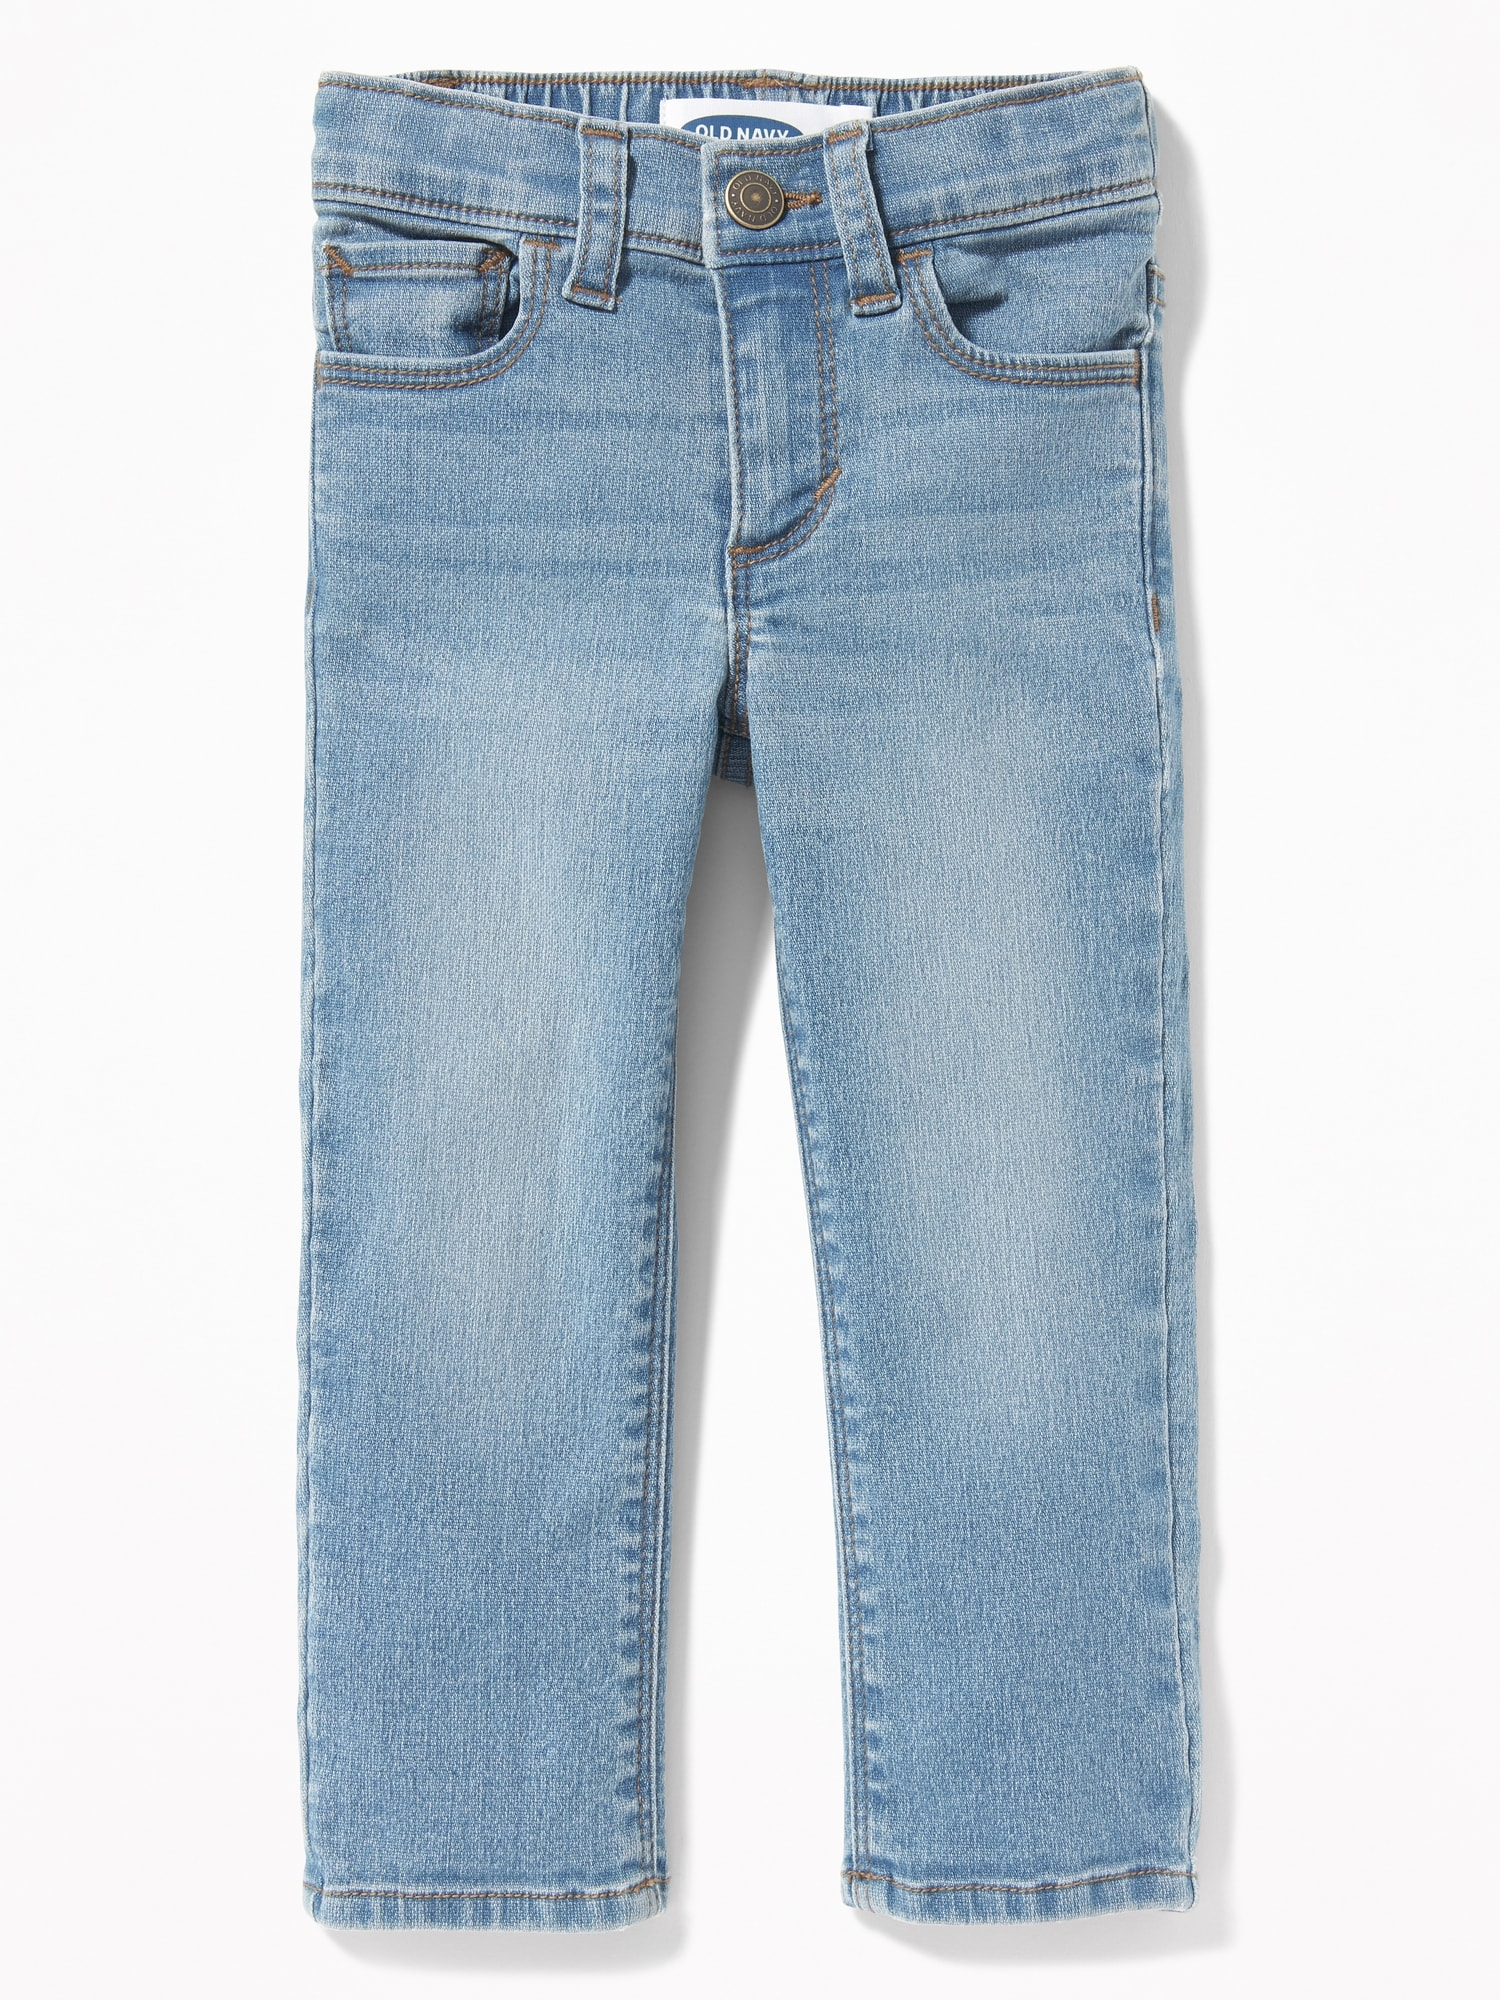 2b8bd442e Karate 24/7 Skinny Jeans for Toddler Boys   Old Navy